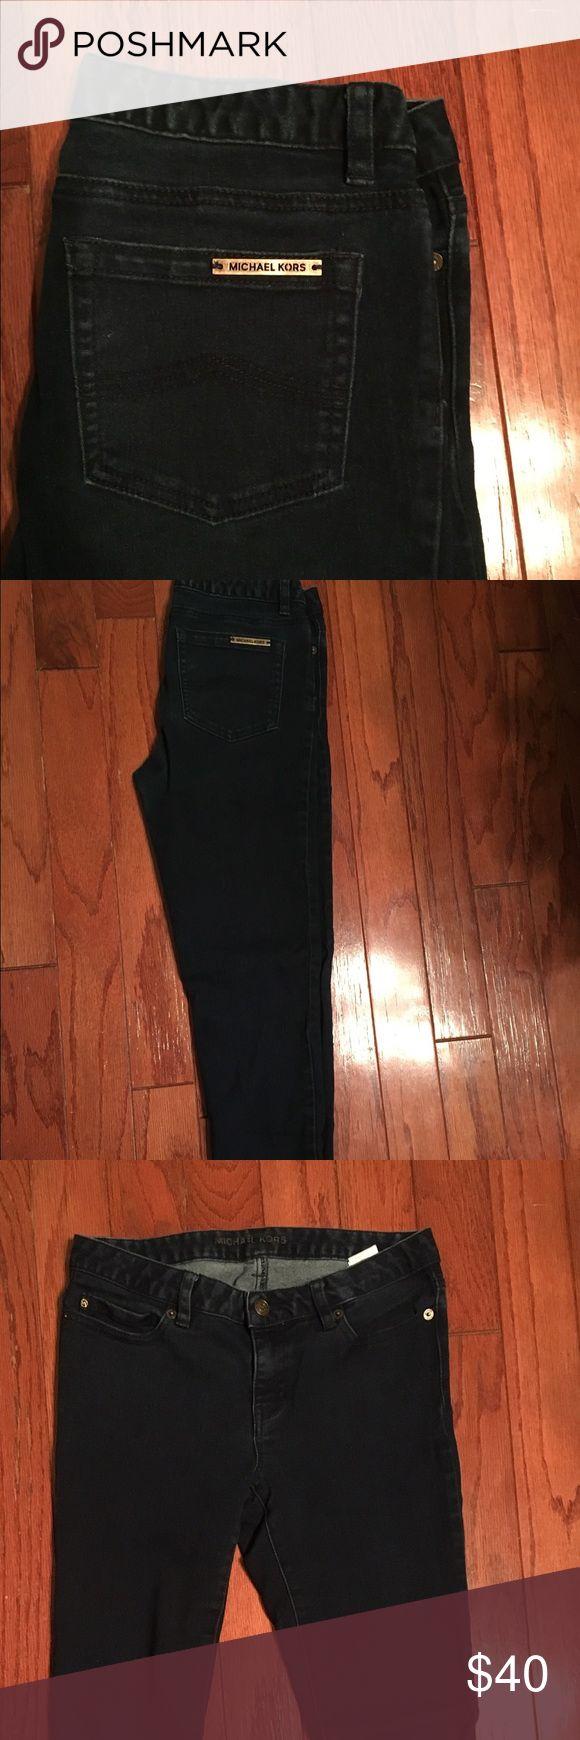 Michael Kors women's skinny jeans. Size 4 NWNT Michael Kors women's skinny jeans. Size 4. New, never worn without tags Michael Kors Jeans Skinny